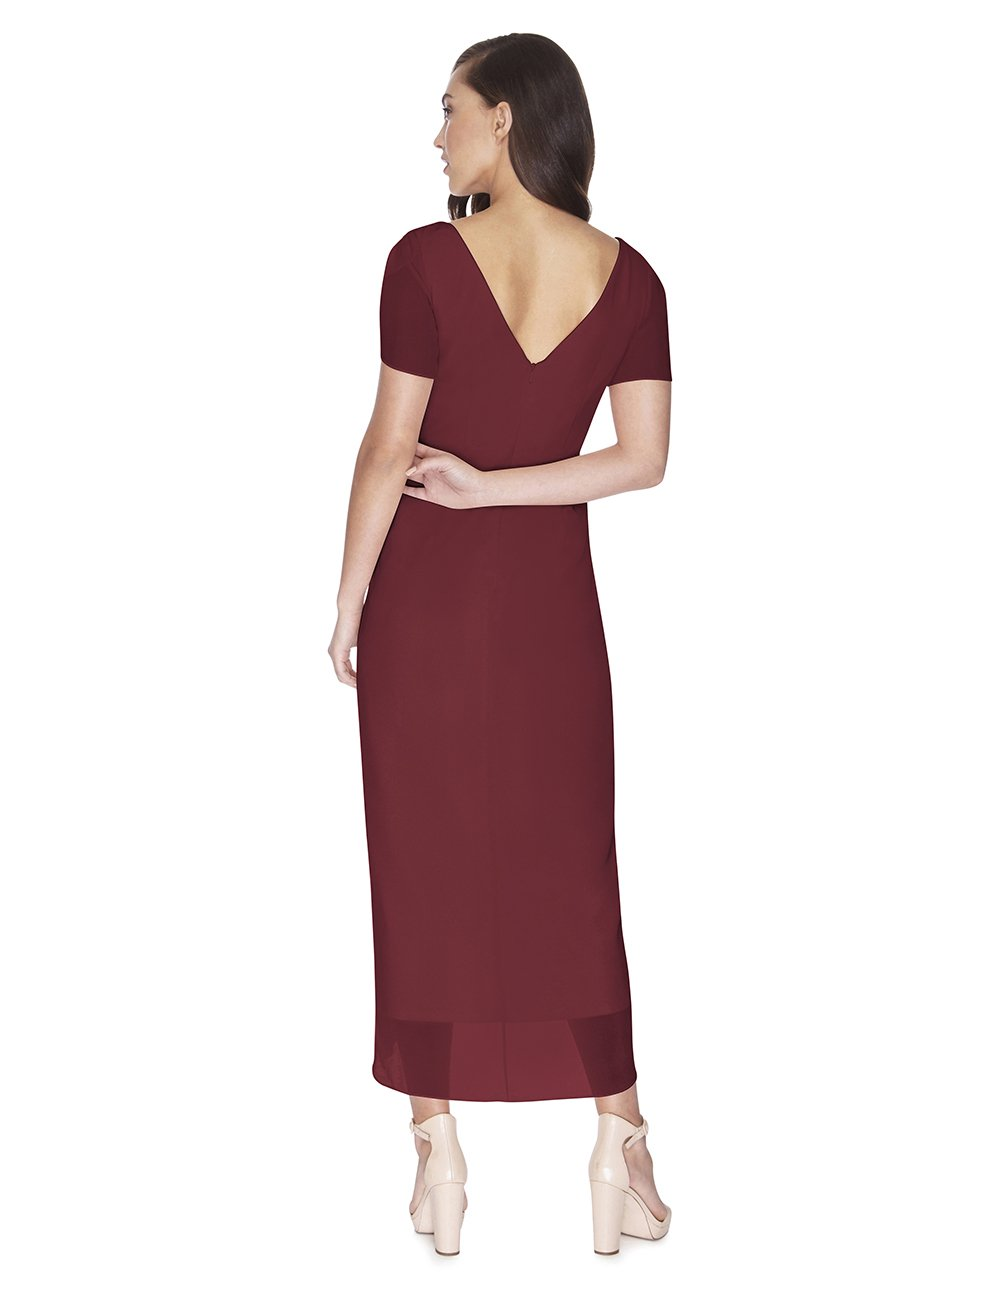 Try Before You Buy Bridesmaids Dress Zara in Merlot